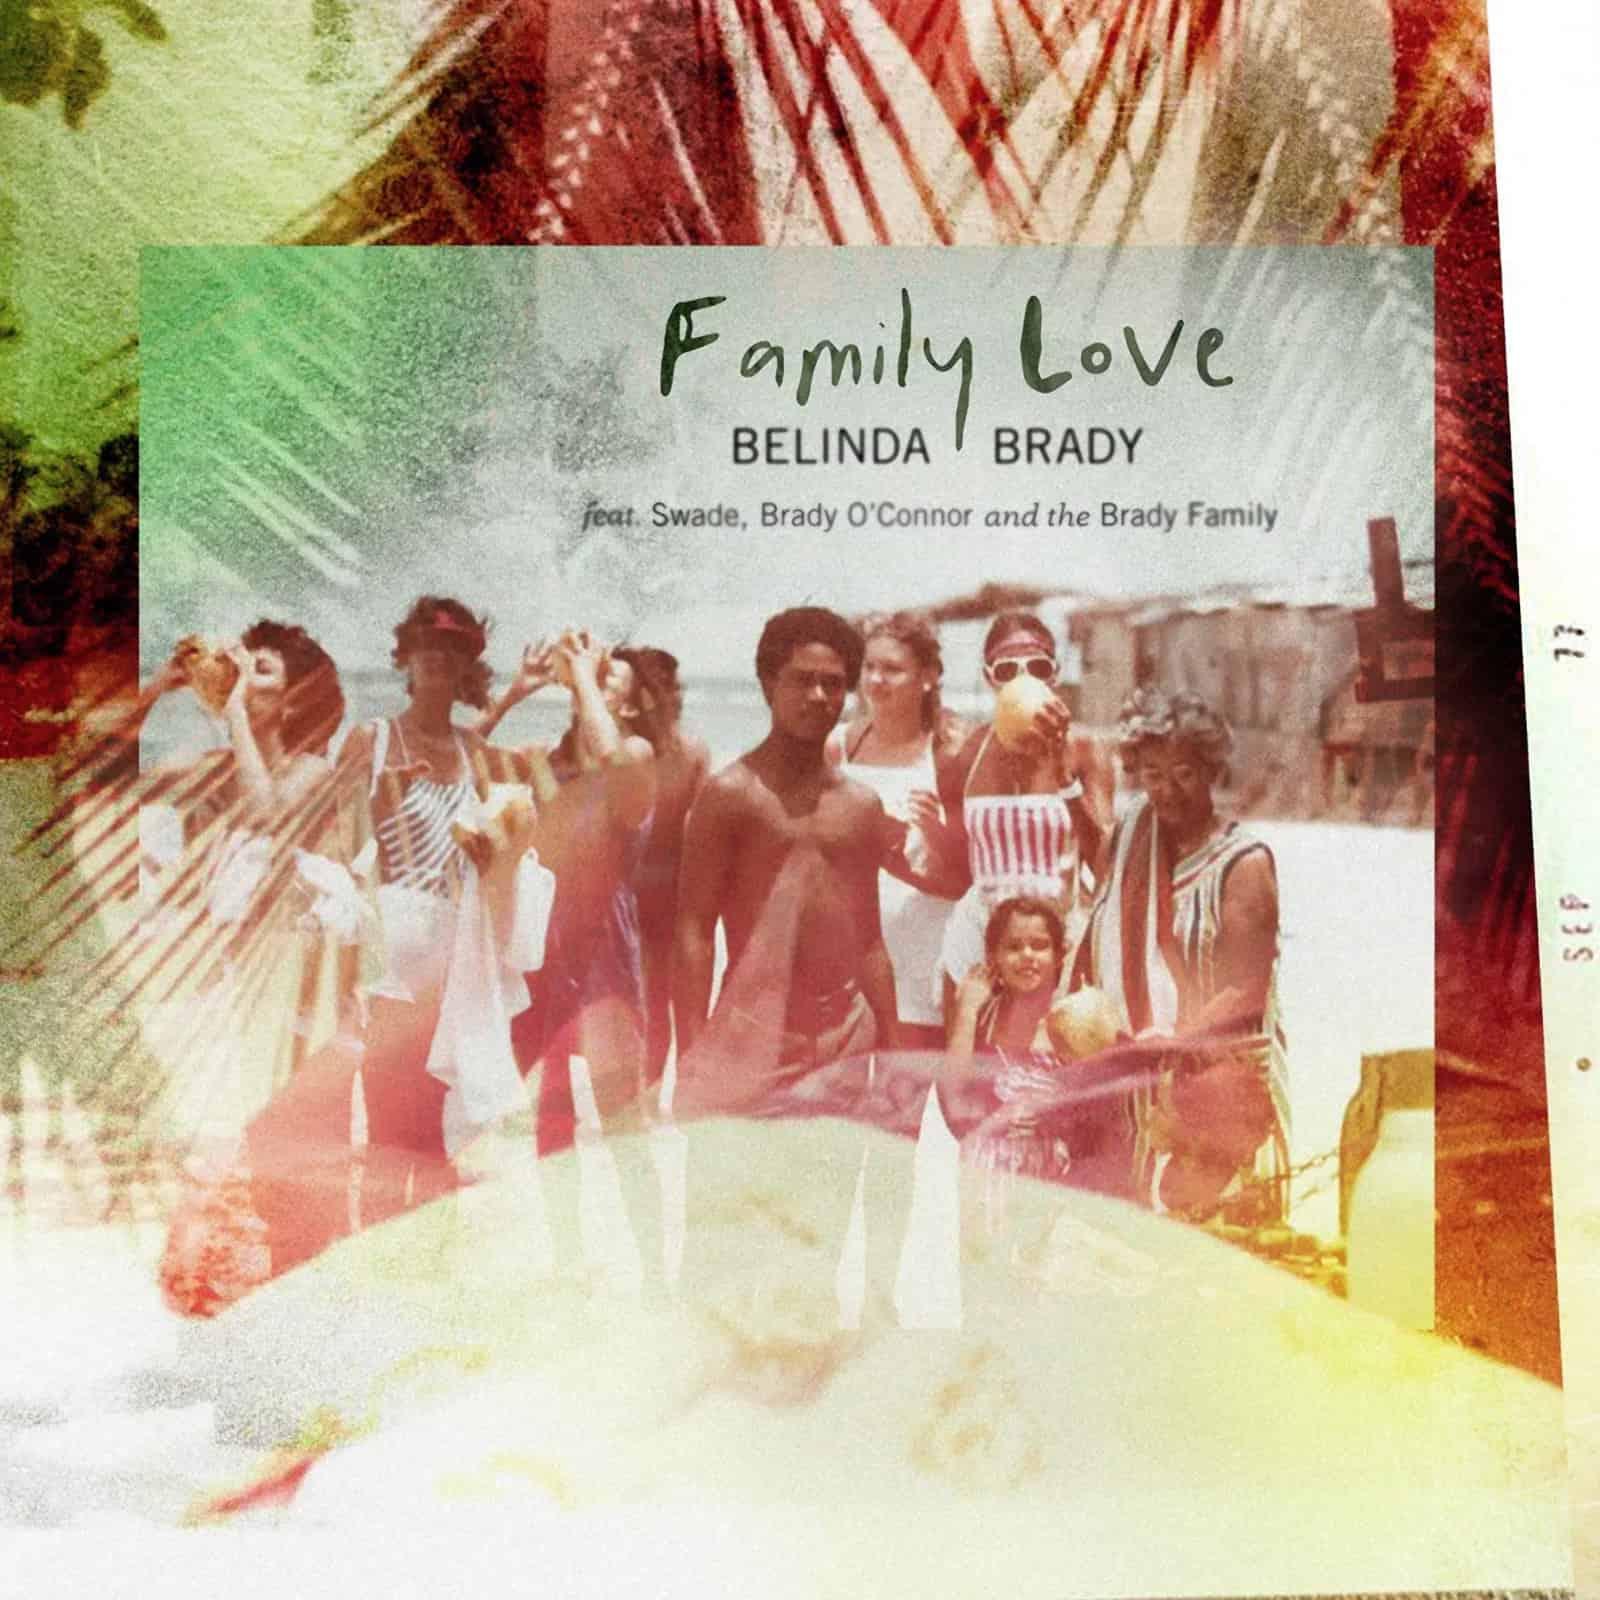 Belinda Brady - Family Love feat. Swade, Brady O